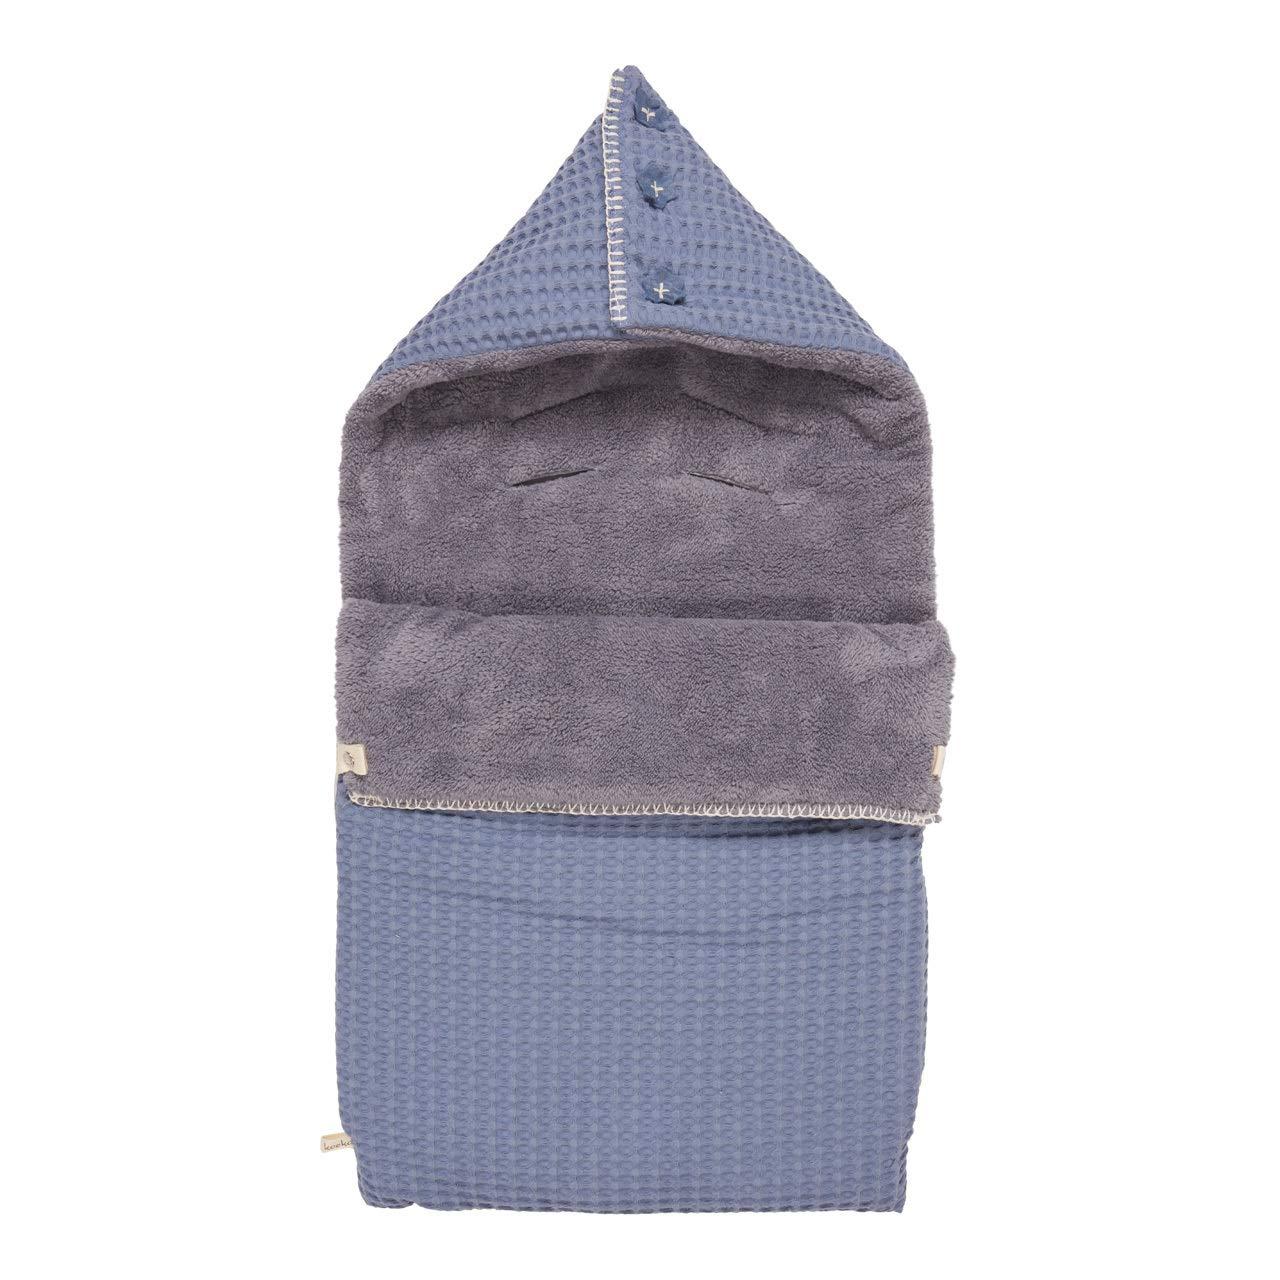 Koeka Fu/ßsack Pl/üsch 3-punktegurt Oslo Stormy Blue//steel Grey